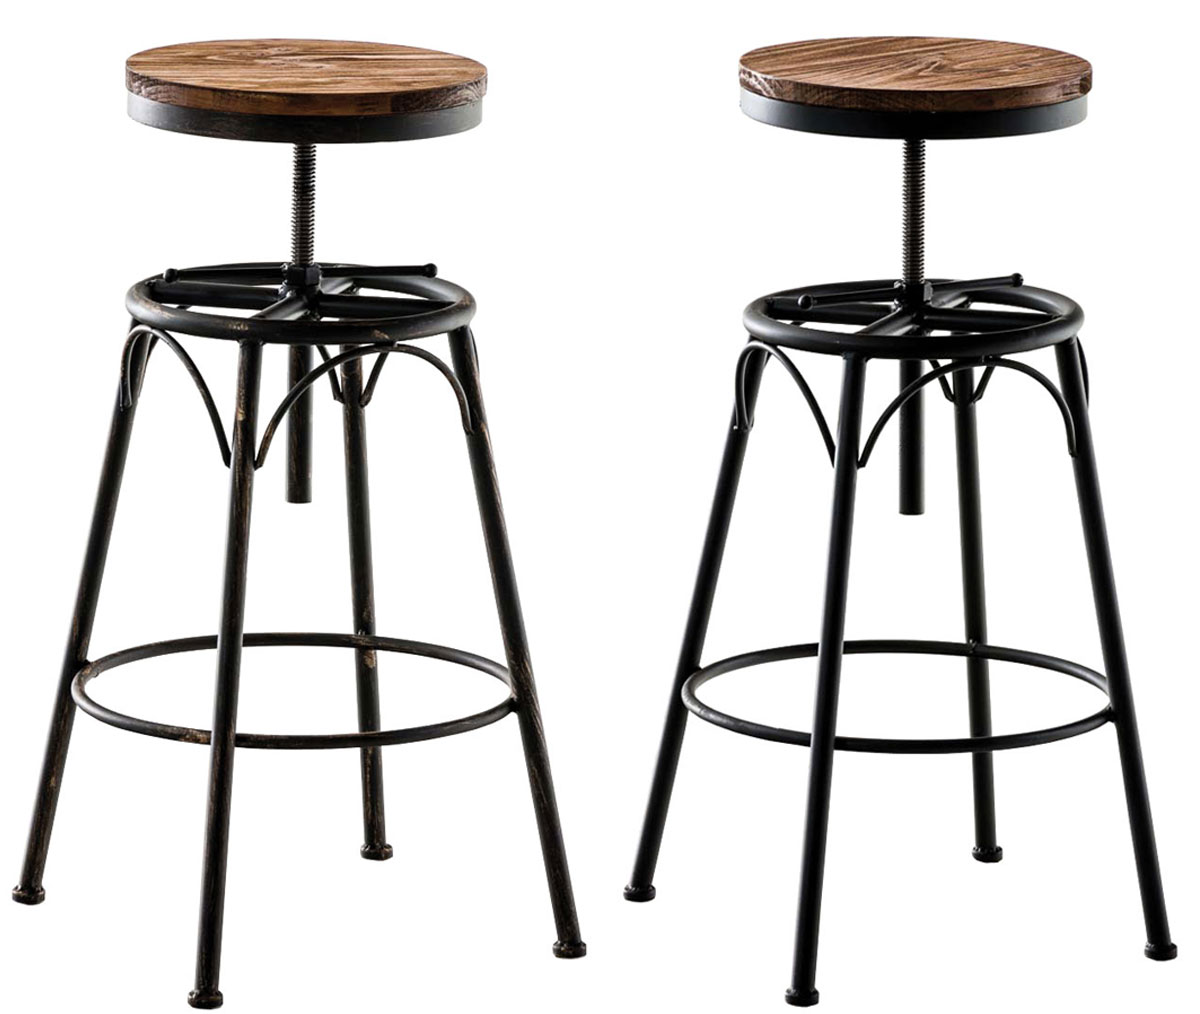 barhocker beam industrial design barstuhl tresenhocker vintage holz metall neu ebay. Black Bedroom Furniture Sets. Home Design Ideas